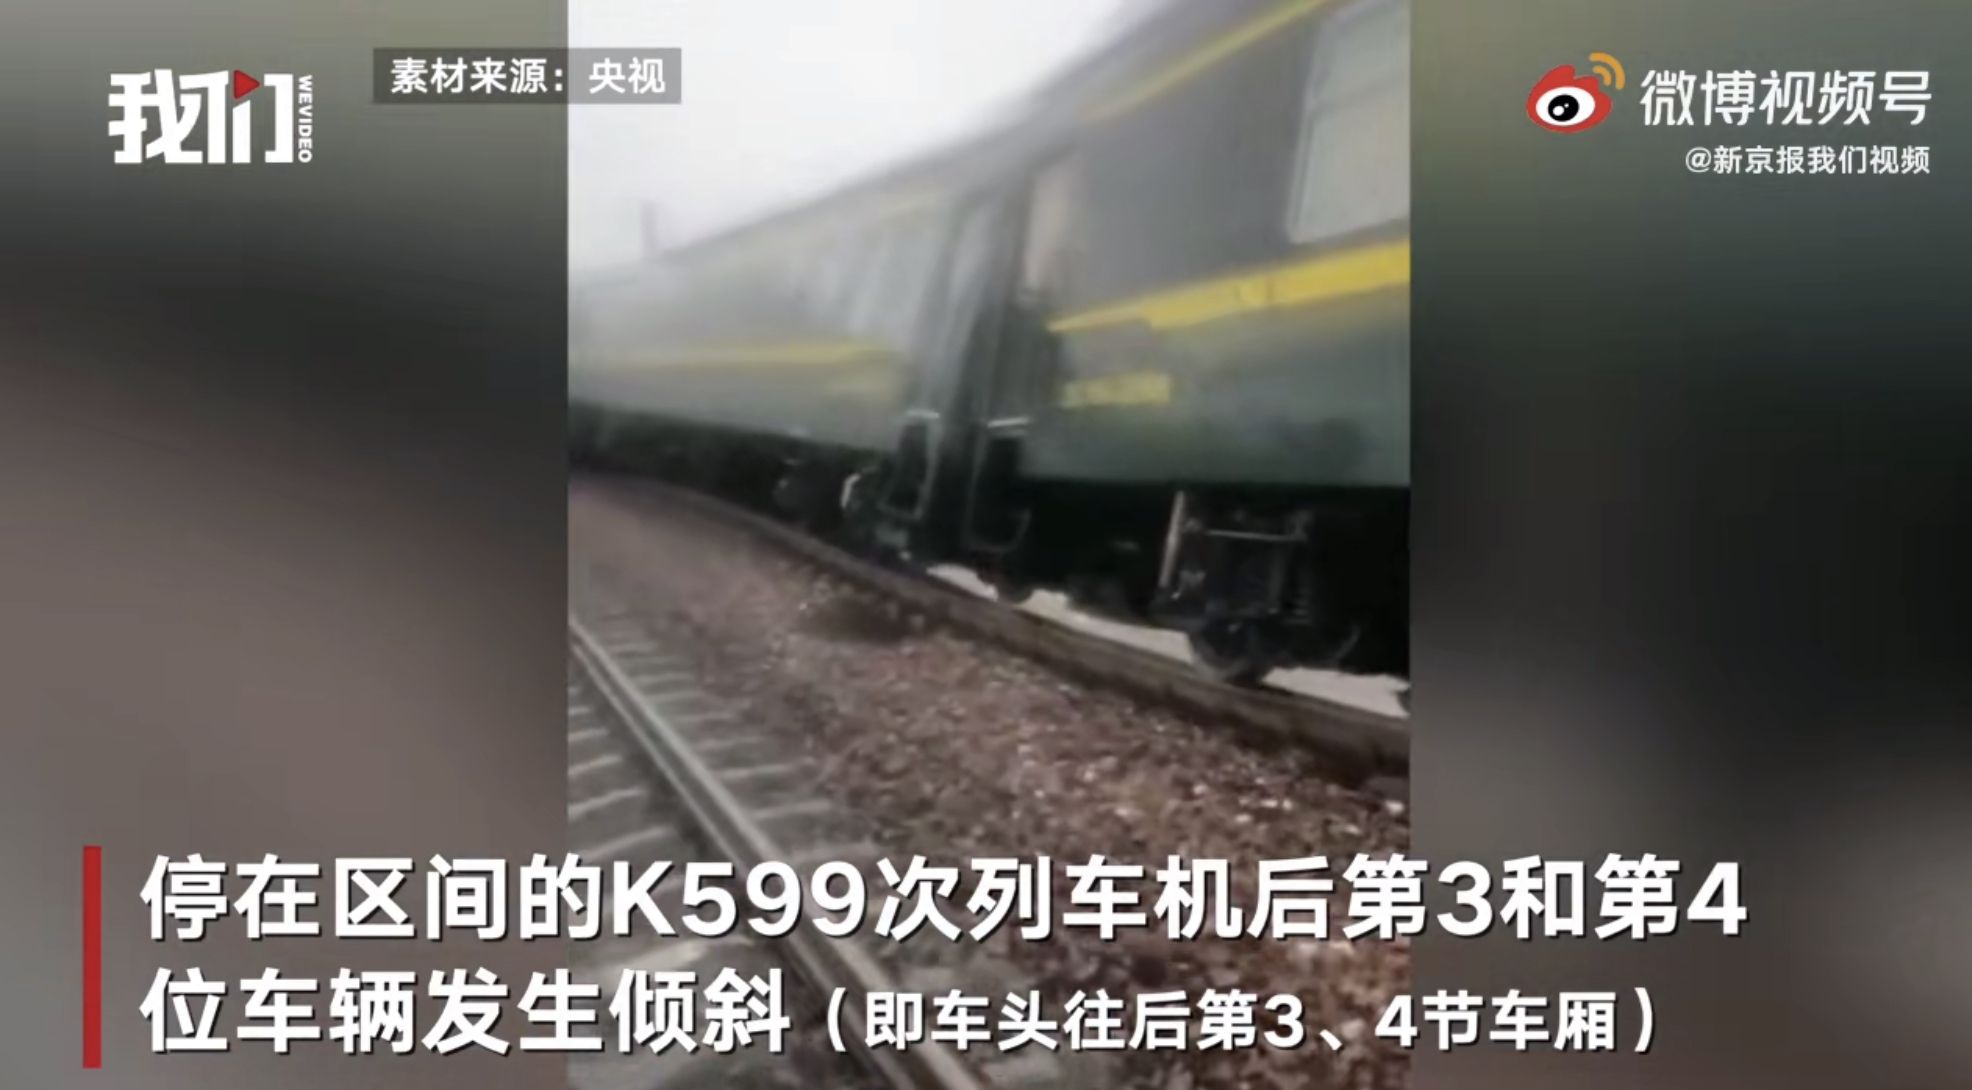 K599列车再受困:有人只剩半瓶水 孩子哭声此起彼伏